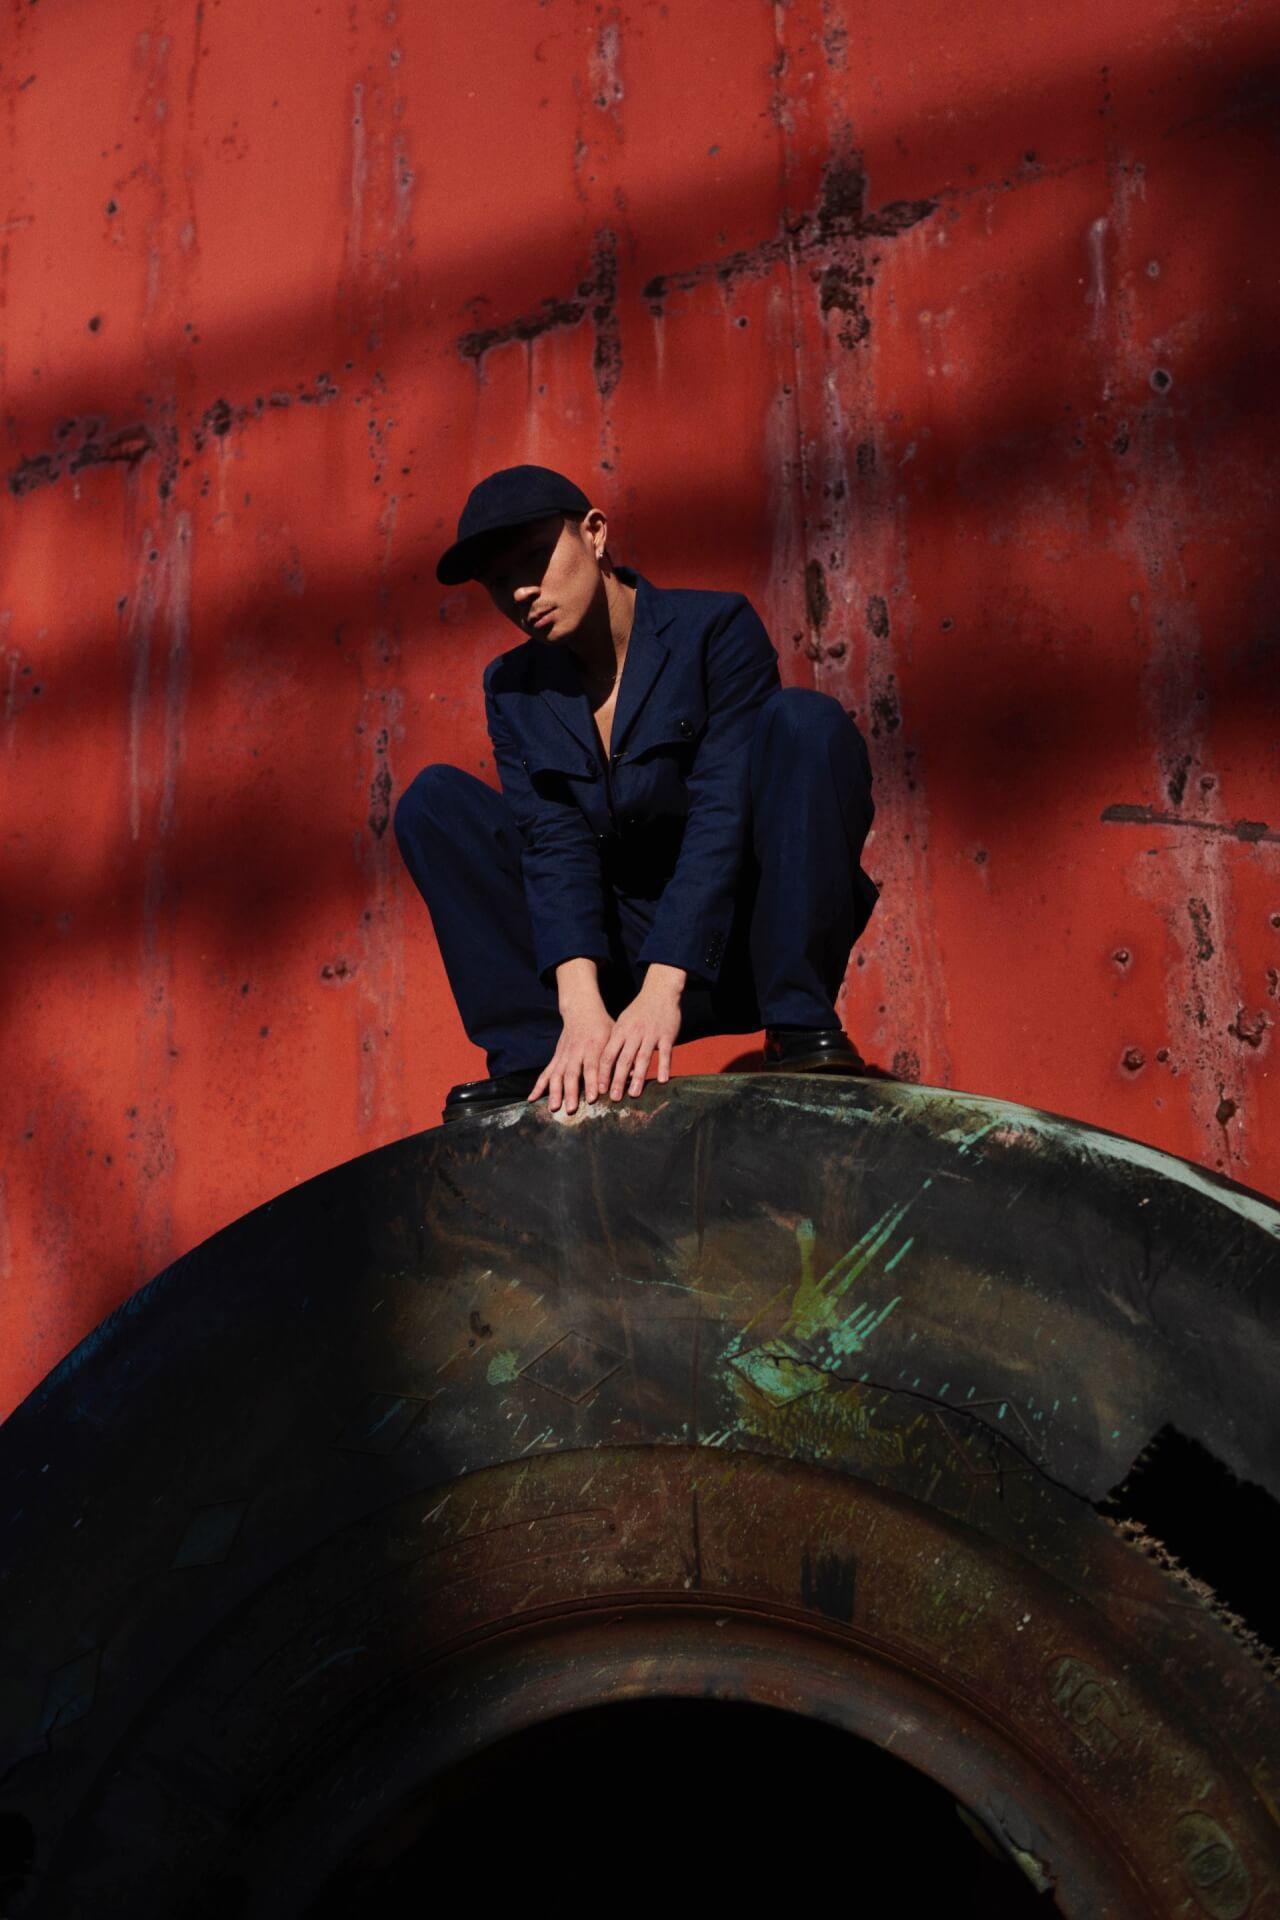 SoulflexメンバーZINとFKDがMusiq Soulchildのカバーソングをフリーダウンロードリリース! music200414_zin_fkd_02